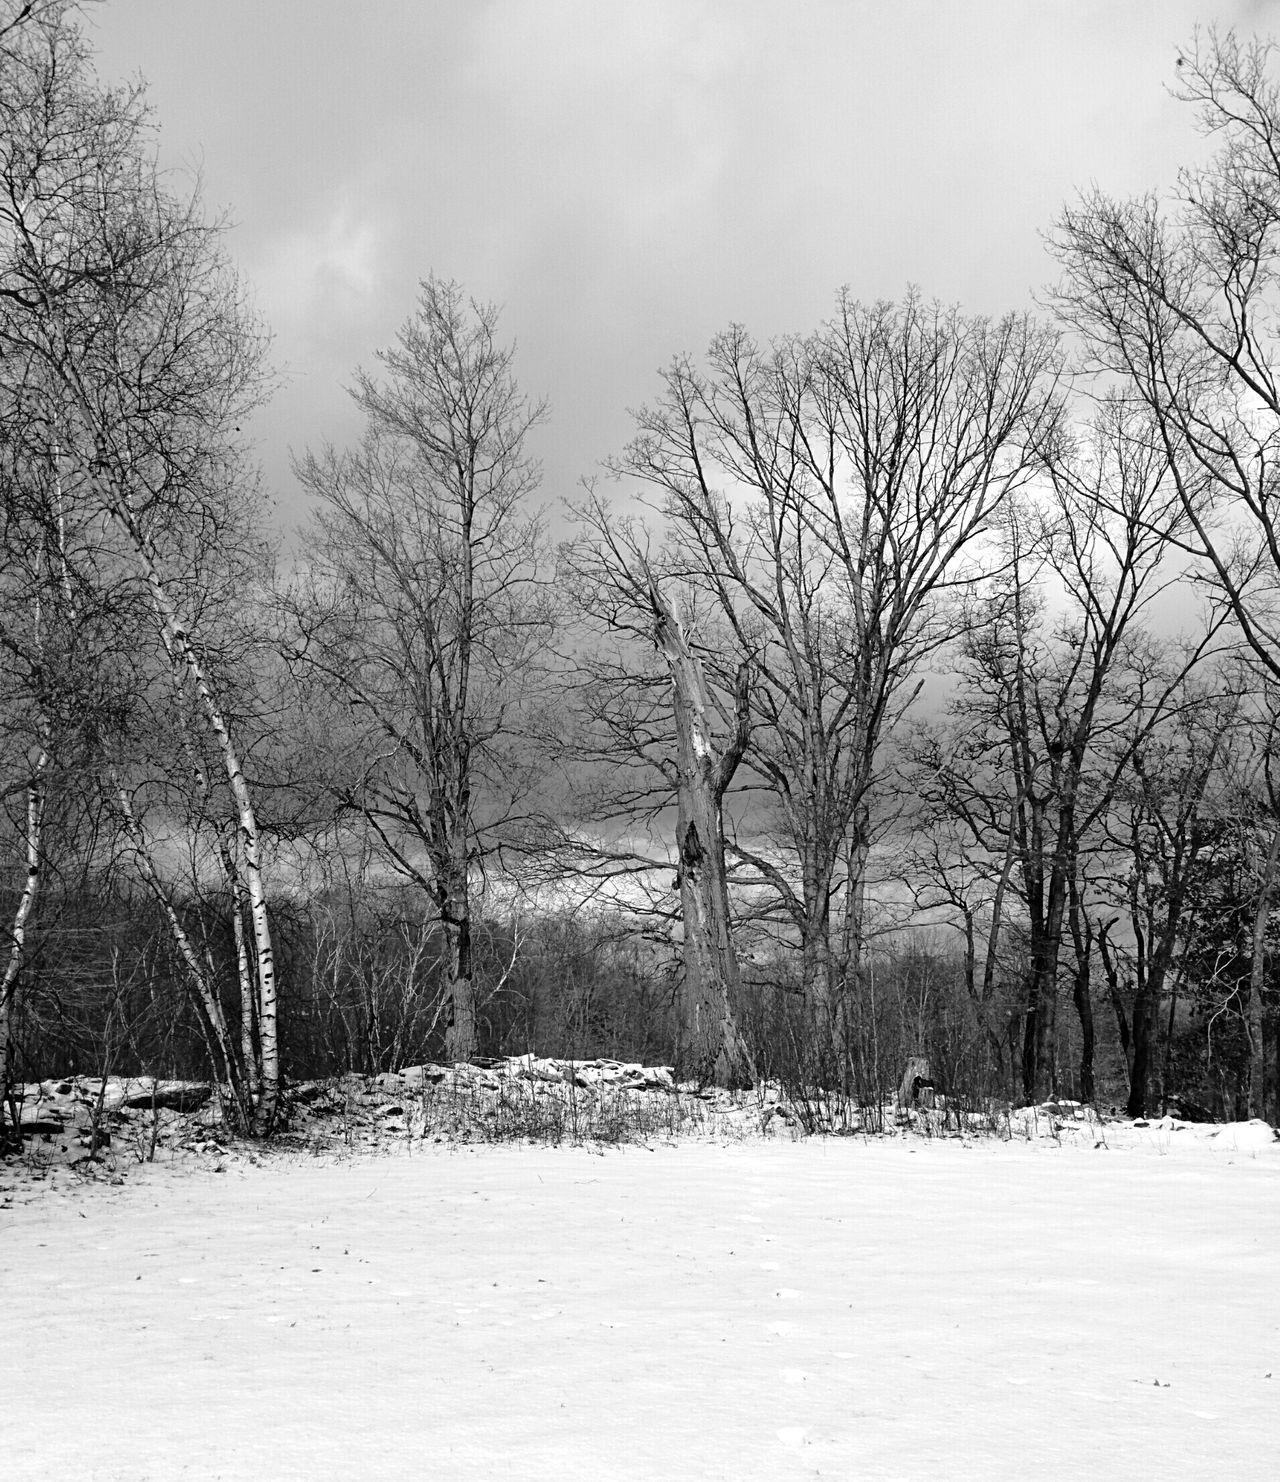 Winter Landscape Trees Dead Trees Snowy Ground